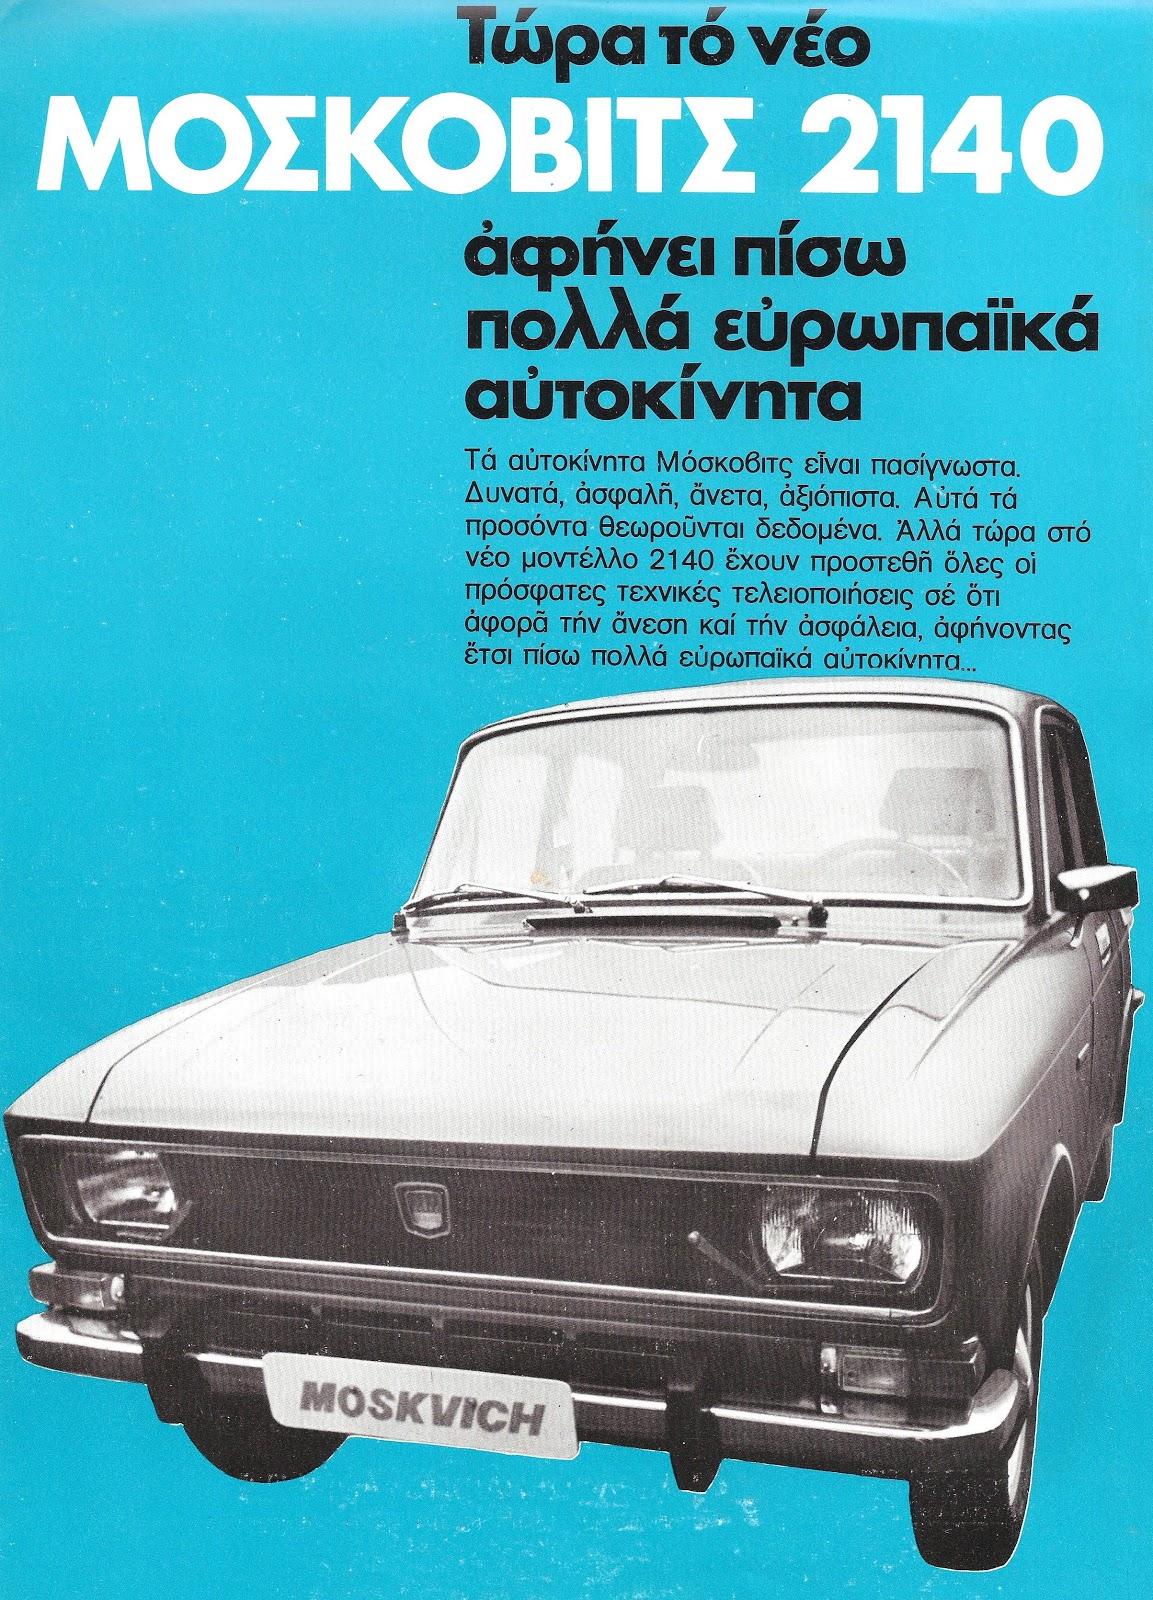 1976-1986-Moskvich-2140-Greece.jpg